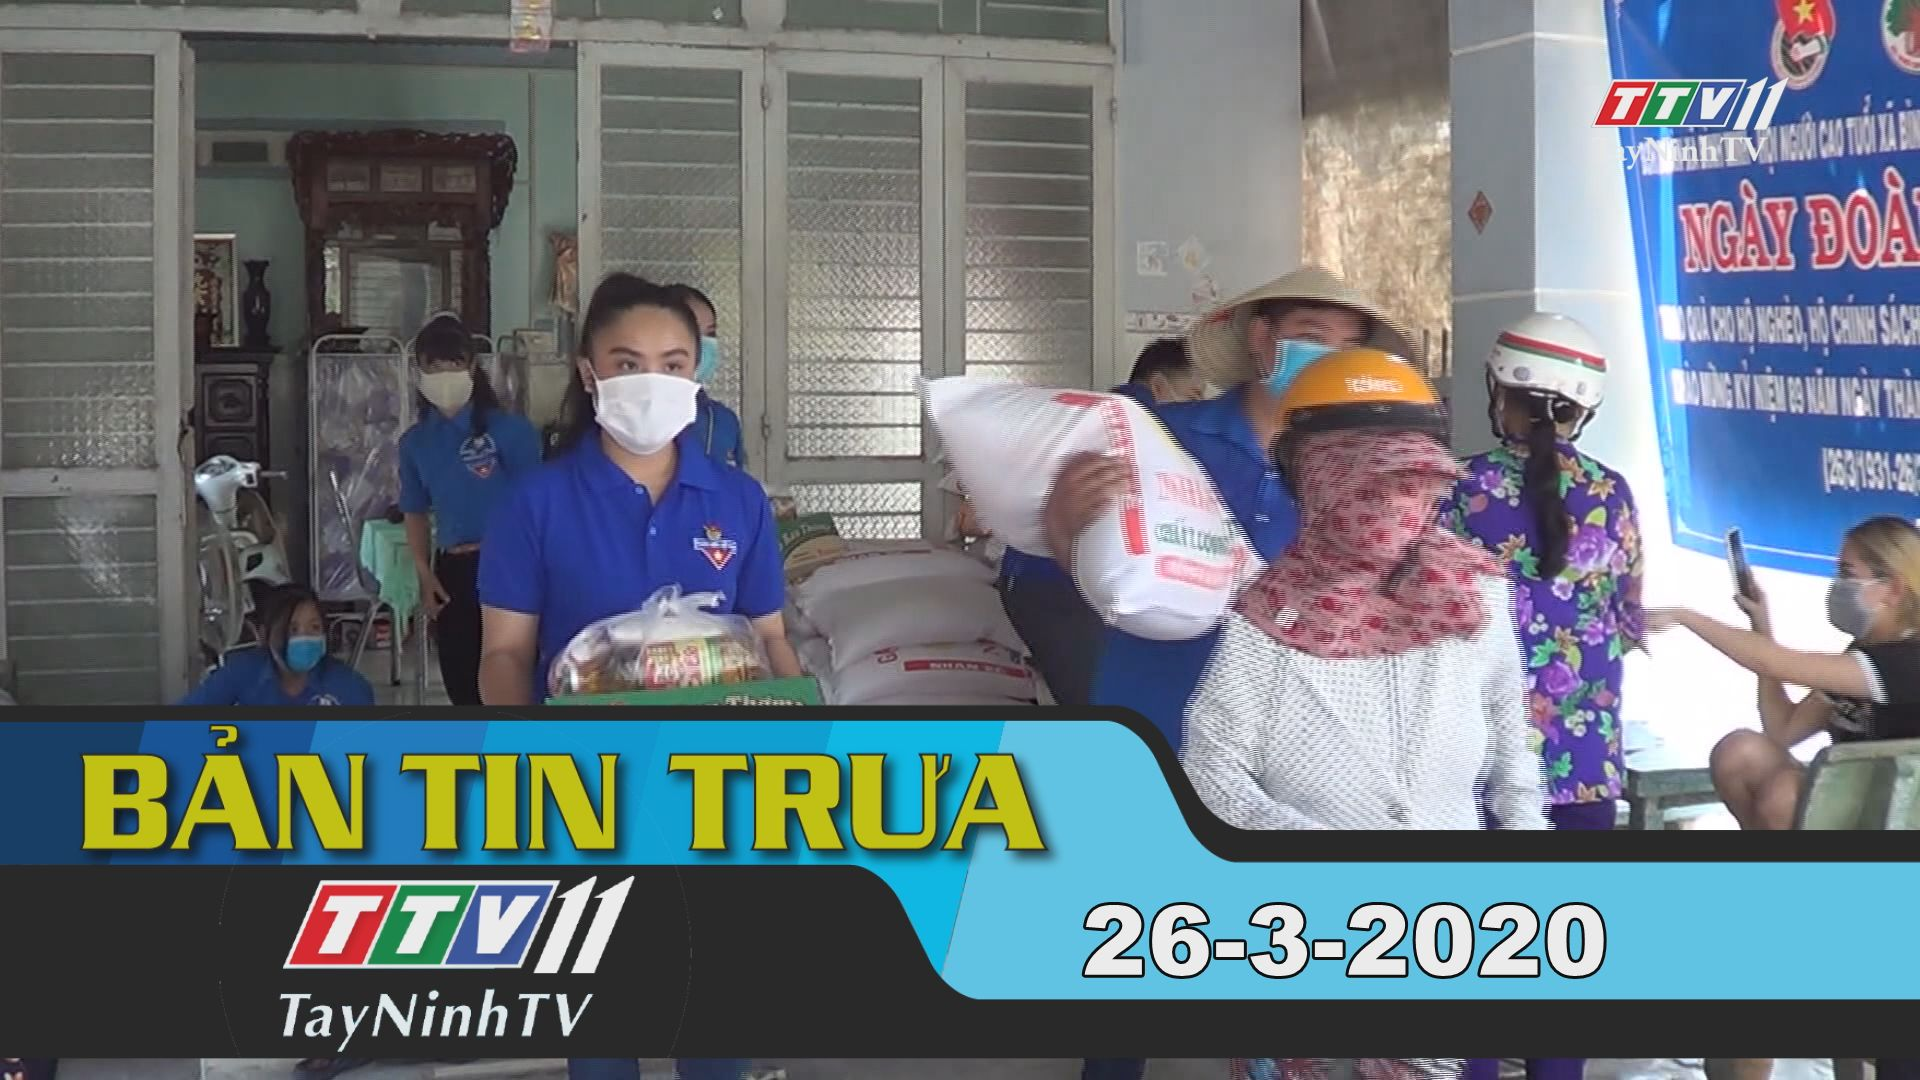 Bản tin trưa 26-3-2020 | Tin tức hôm nay | TayNinhTV